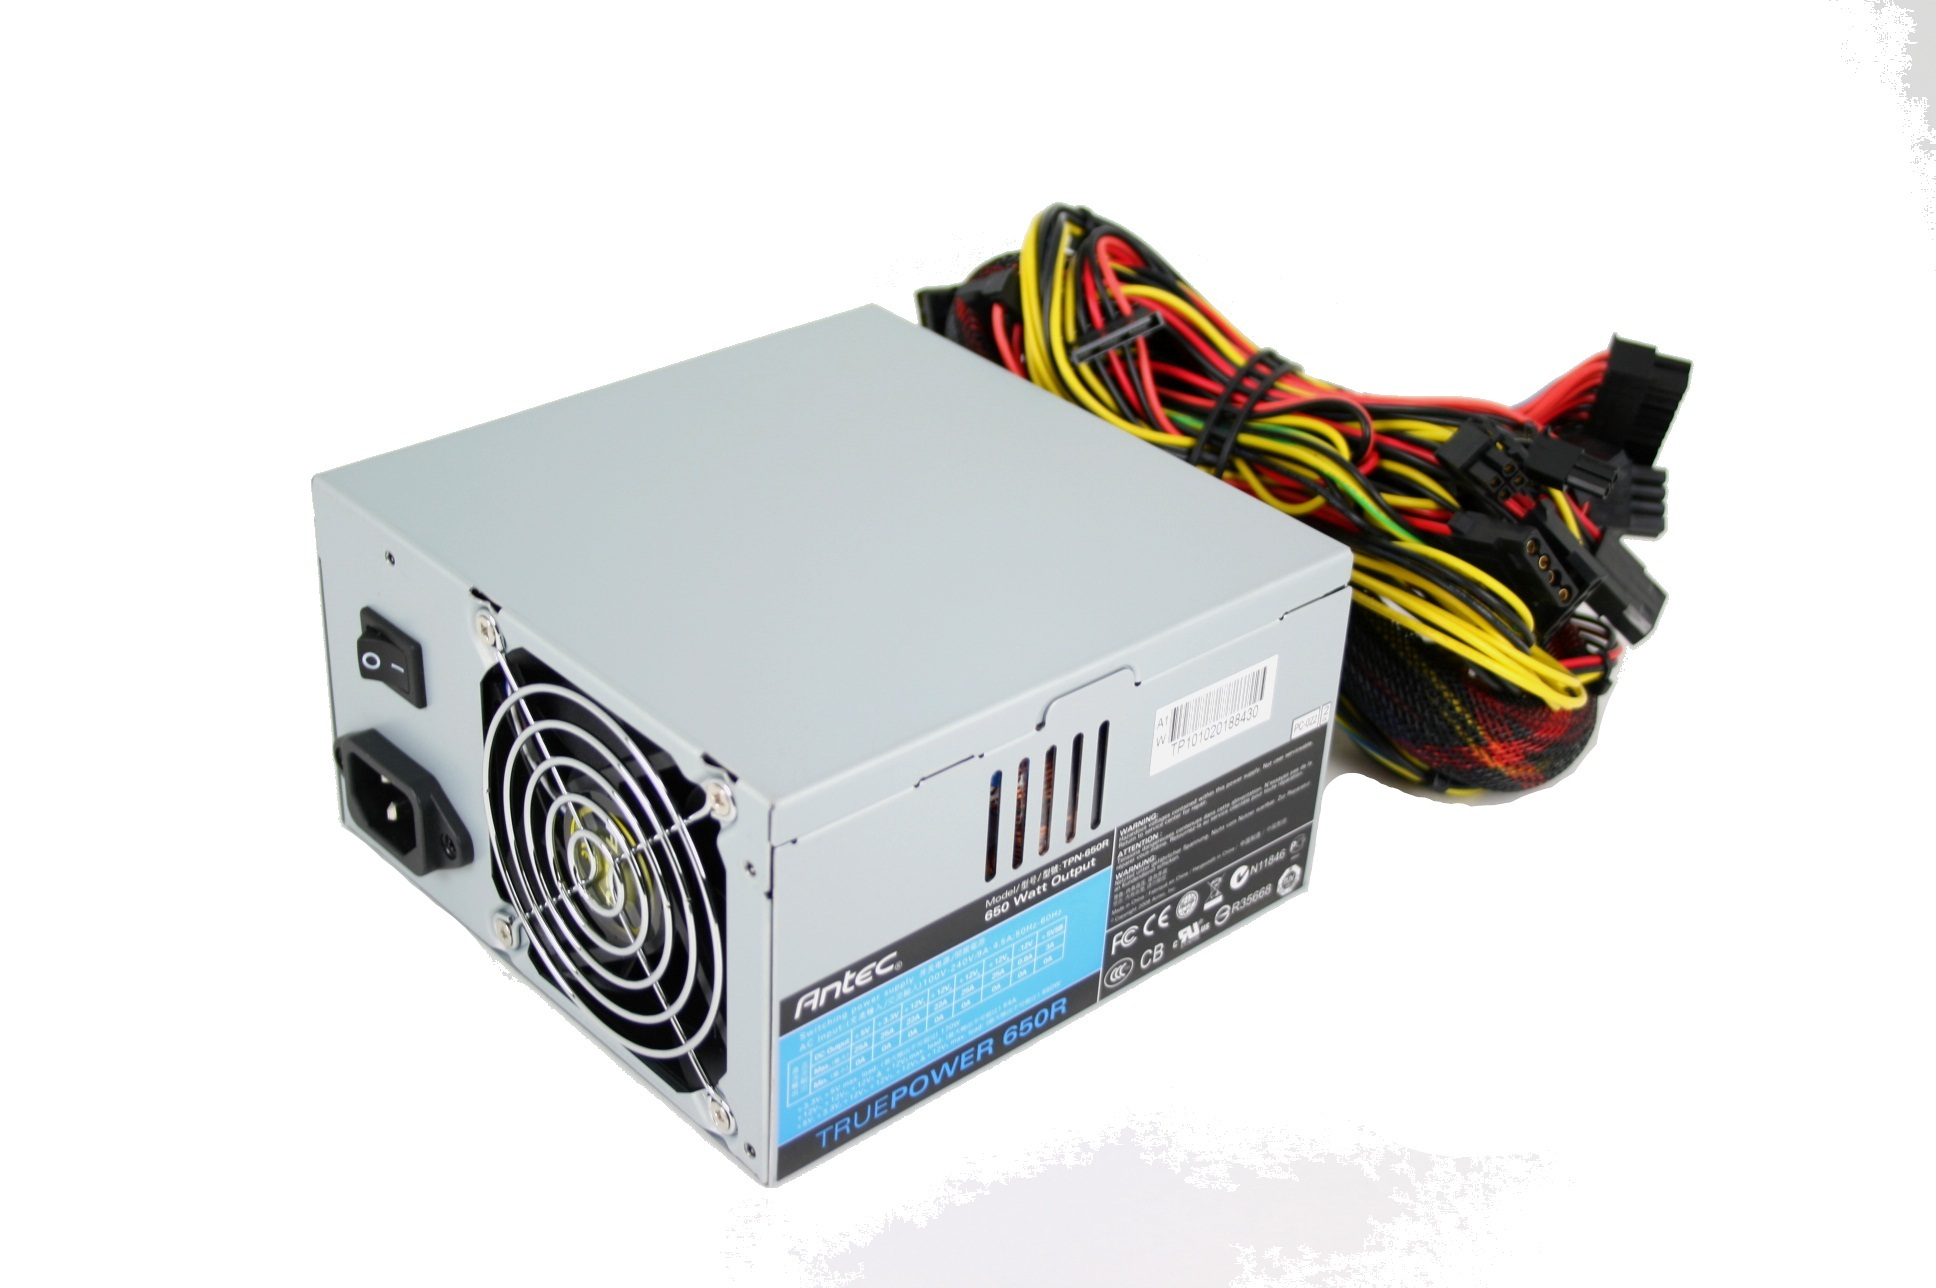 Configure PC w/ Antec TruePower 650R 650W Power Supply Power